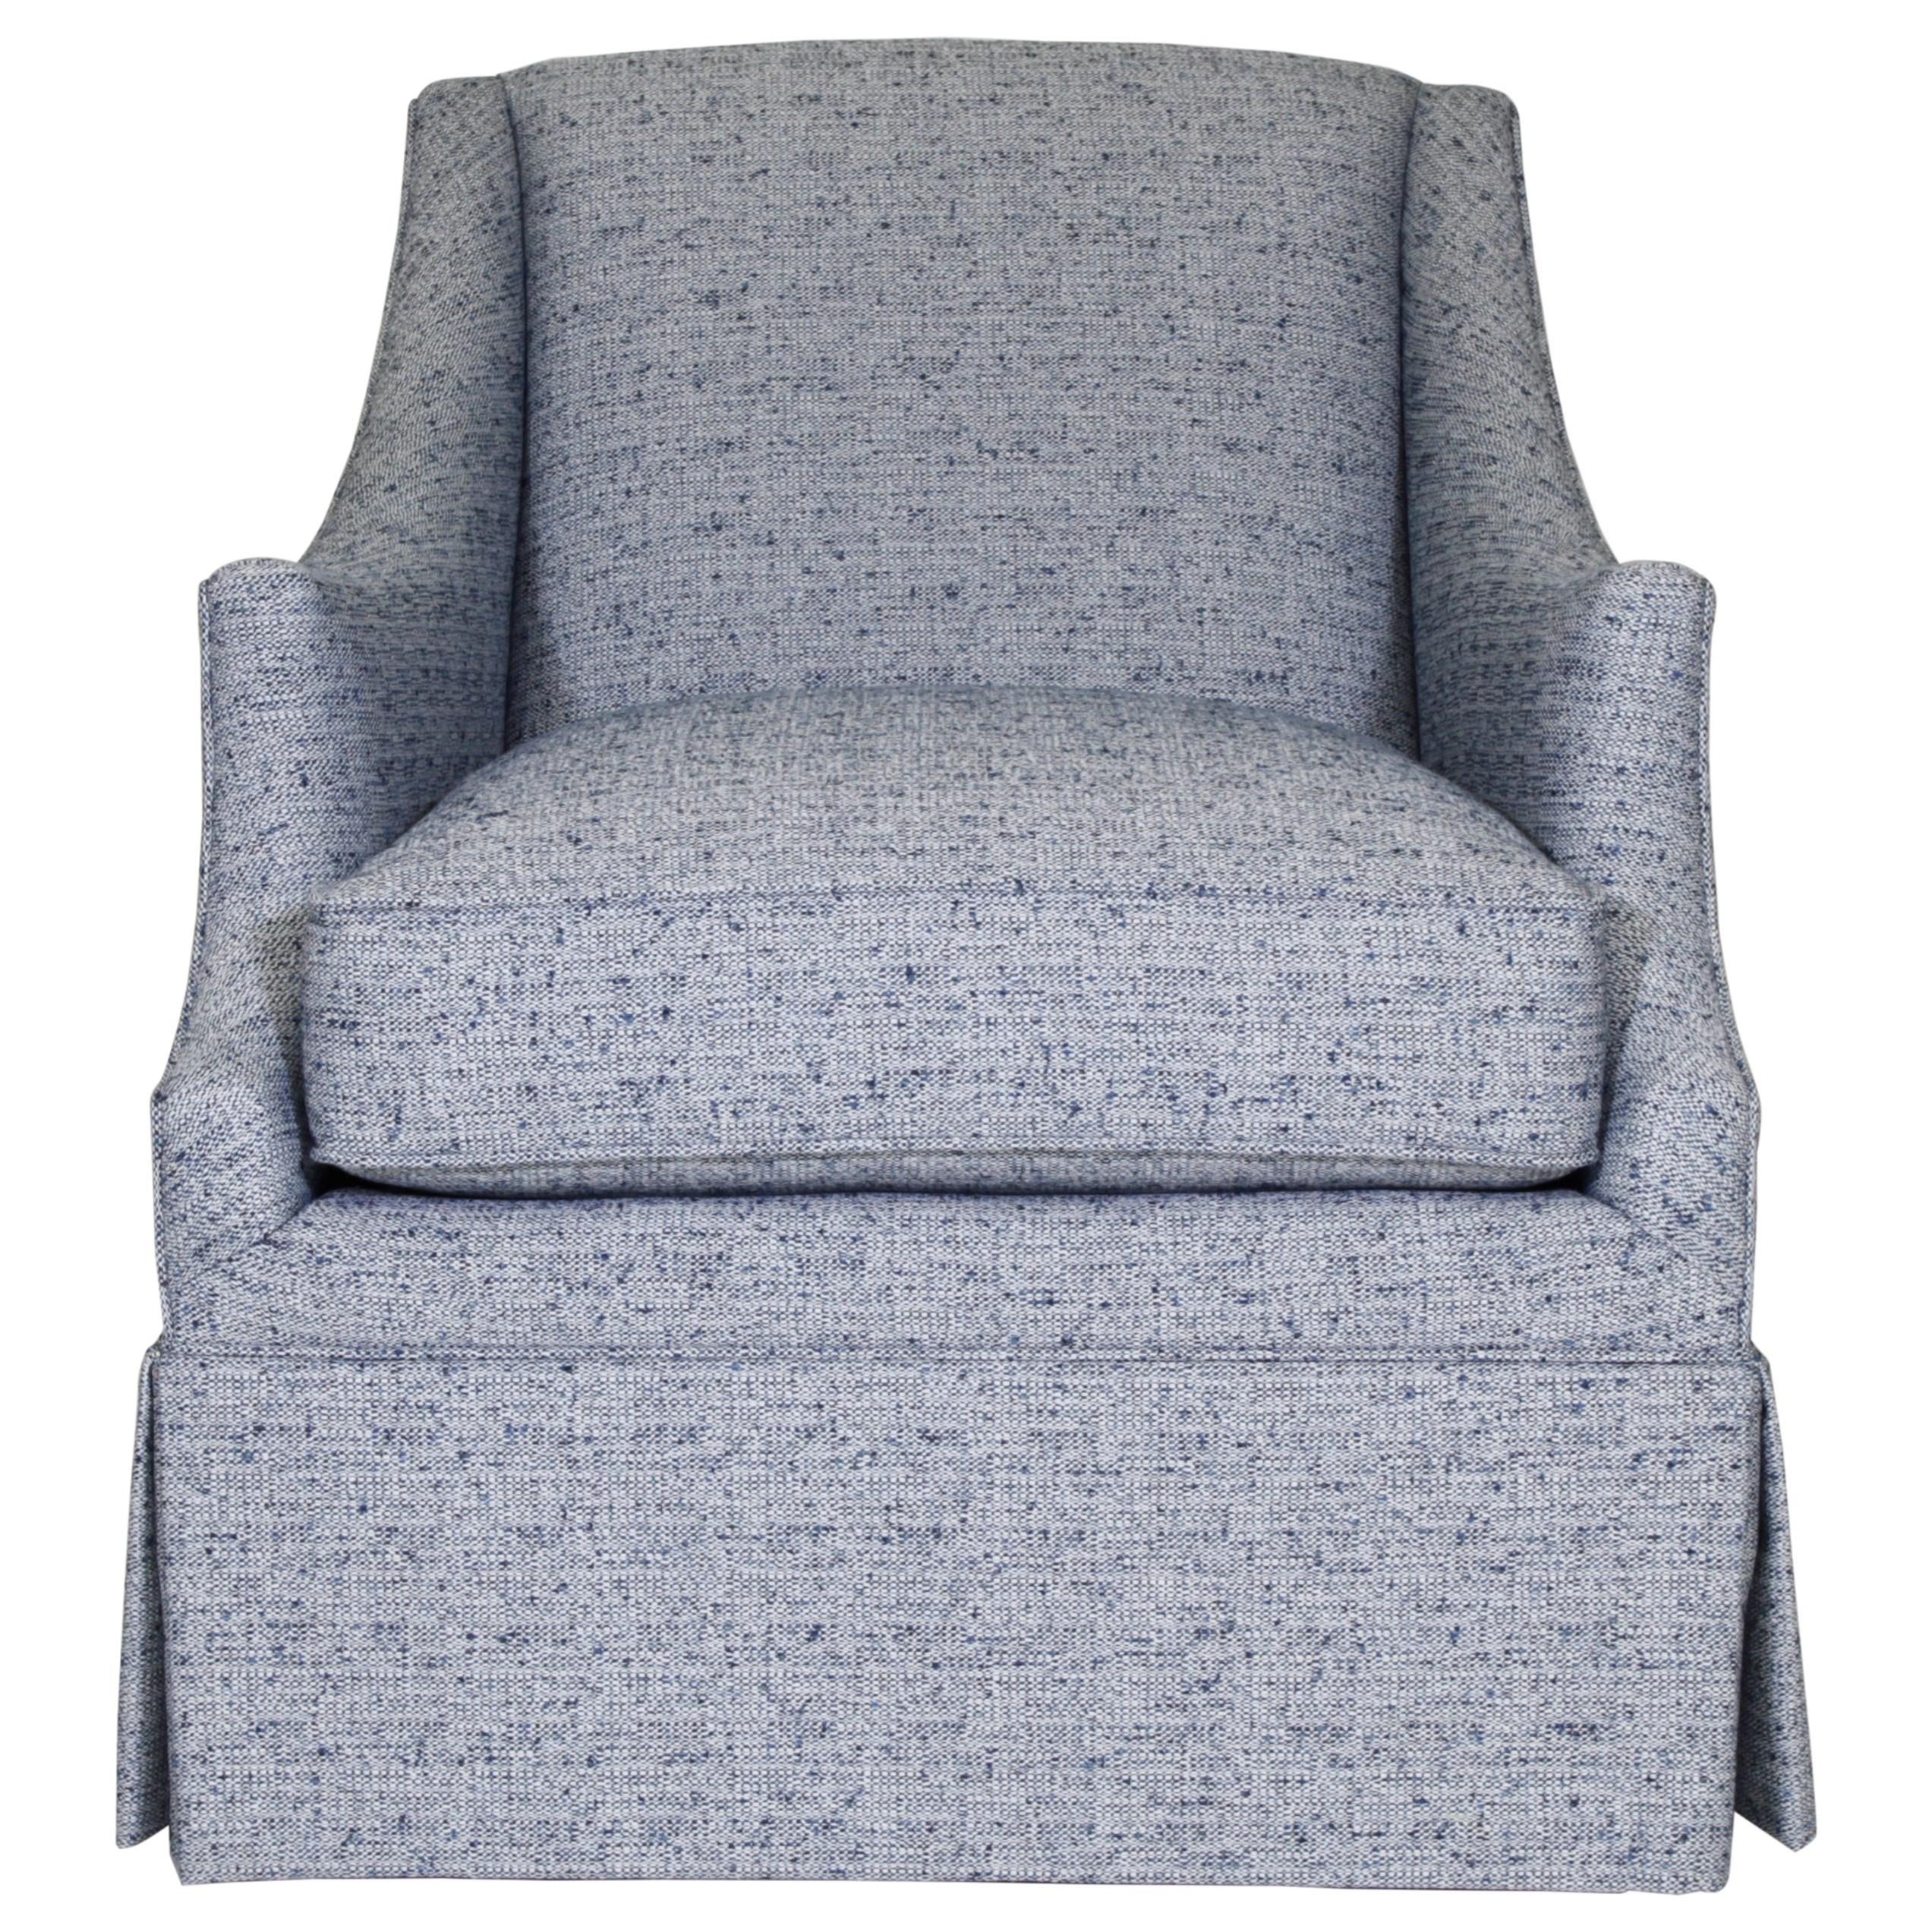 Enzo Chair